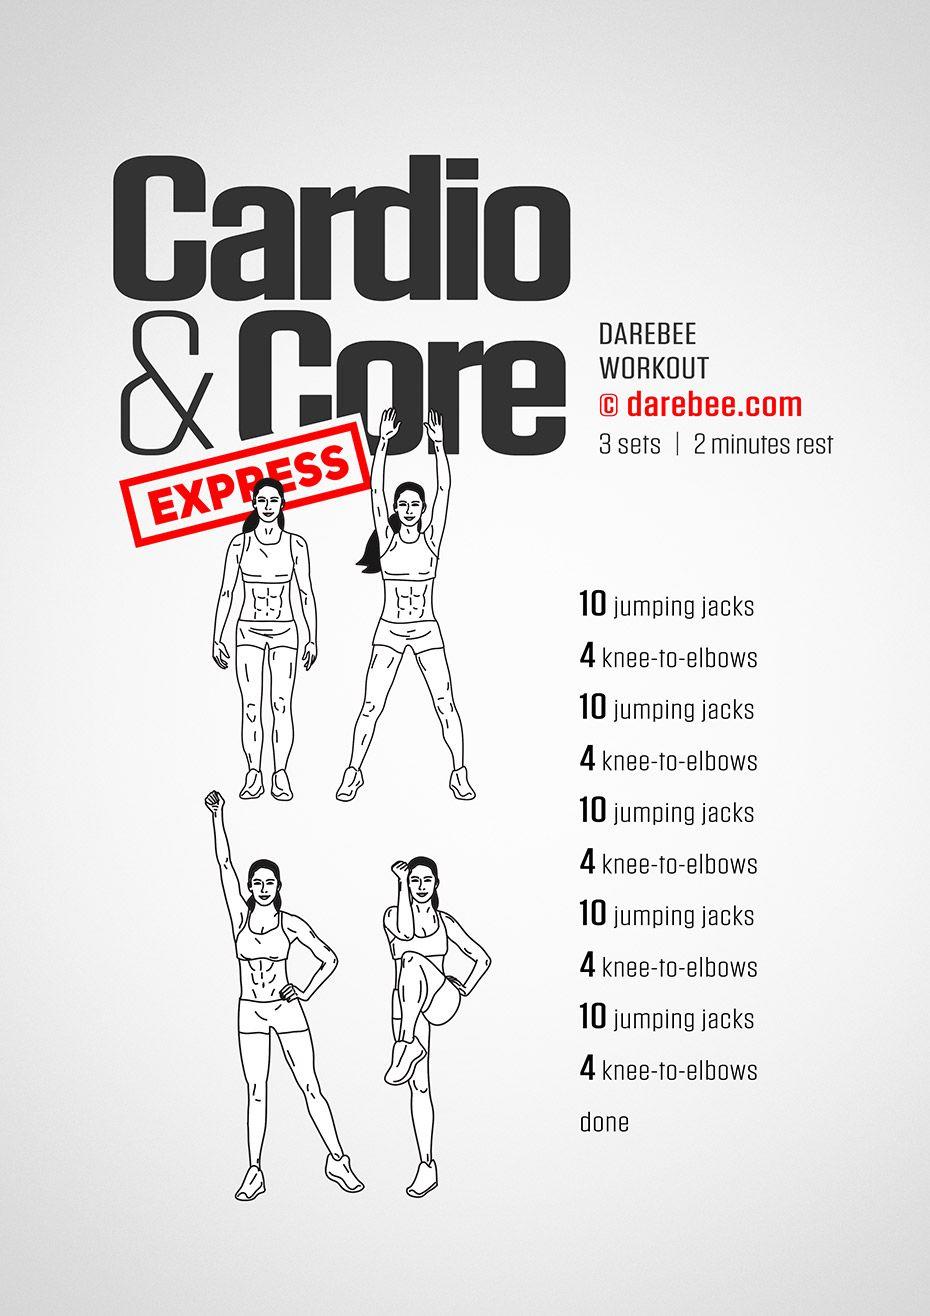 Cardio Core Express Workout By Darebee Darebee Workout